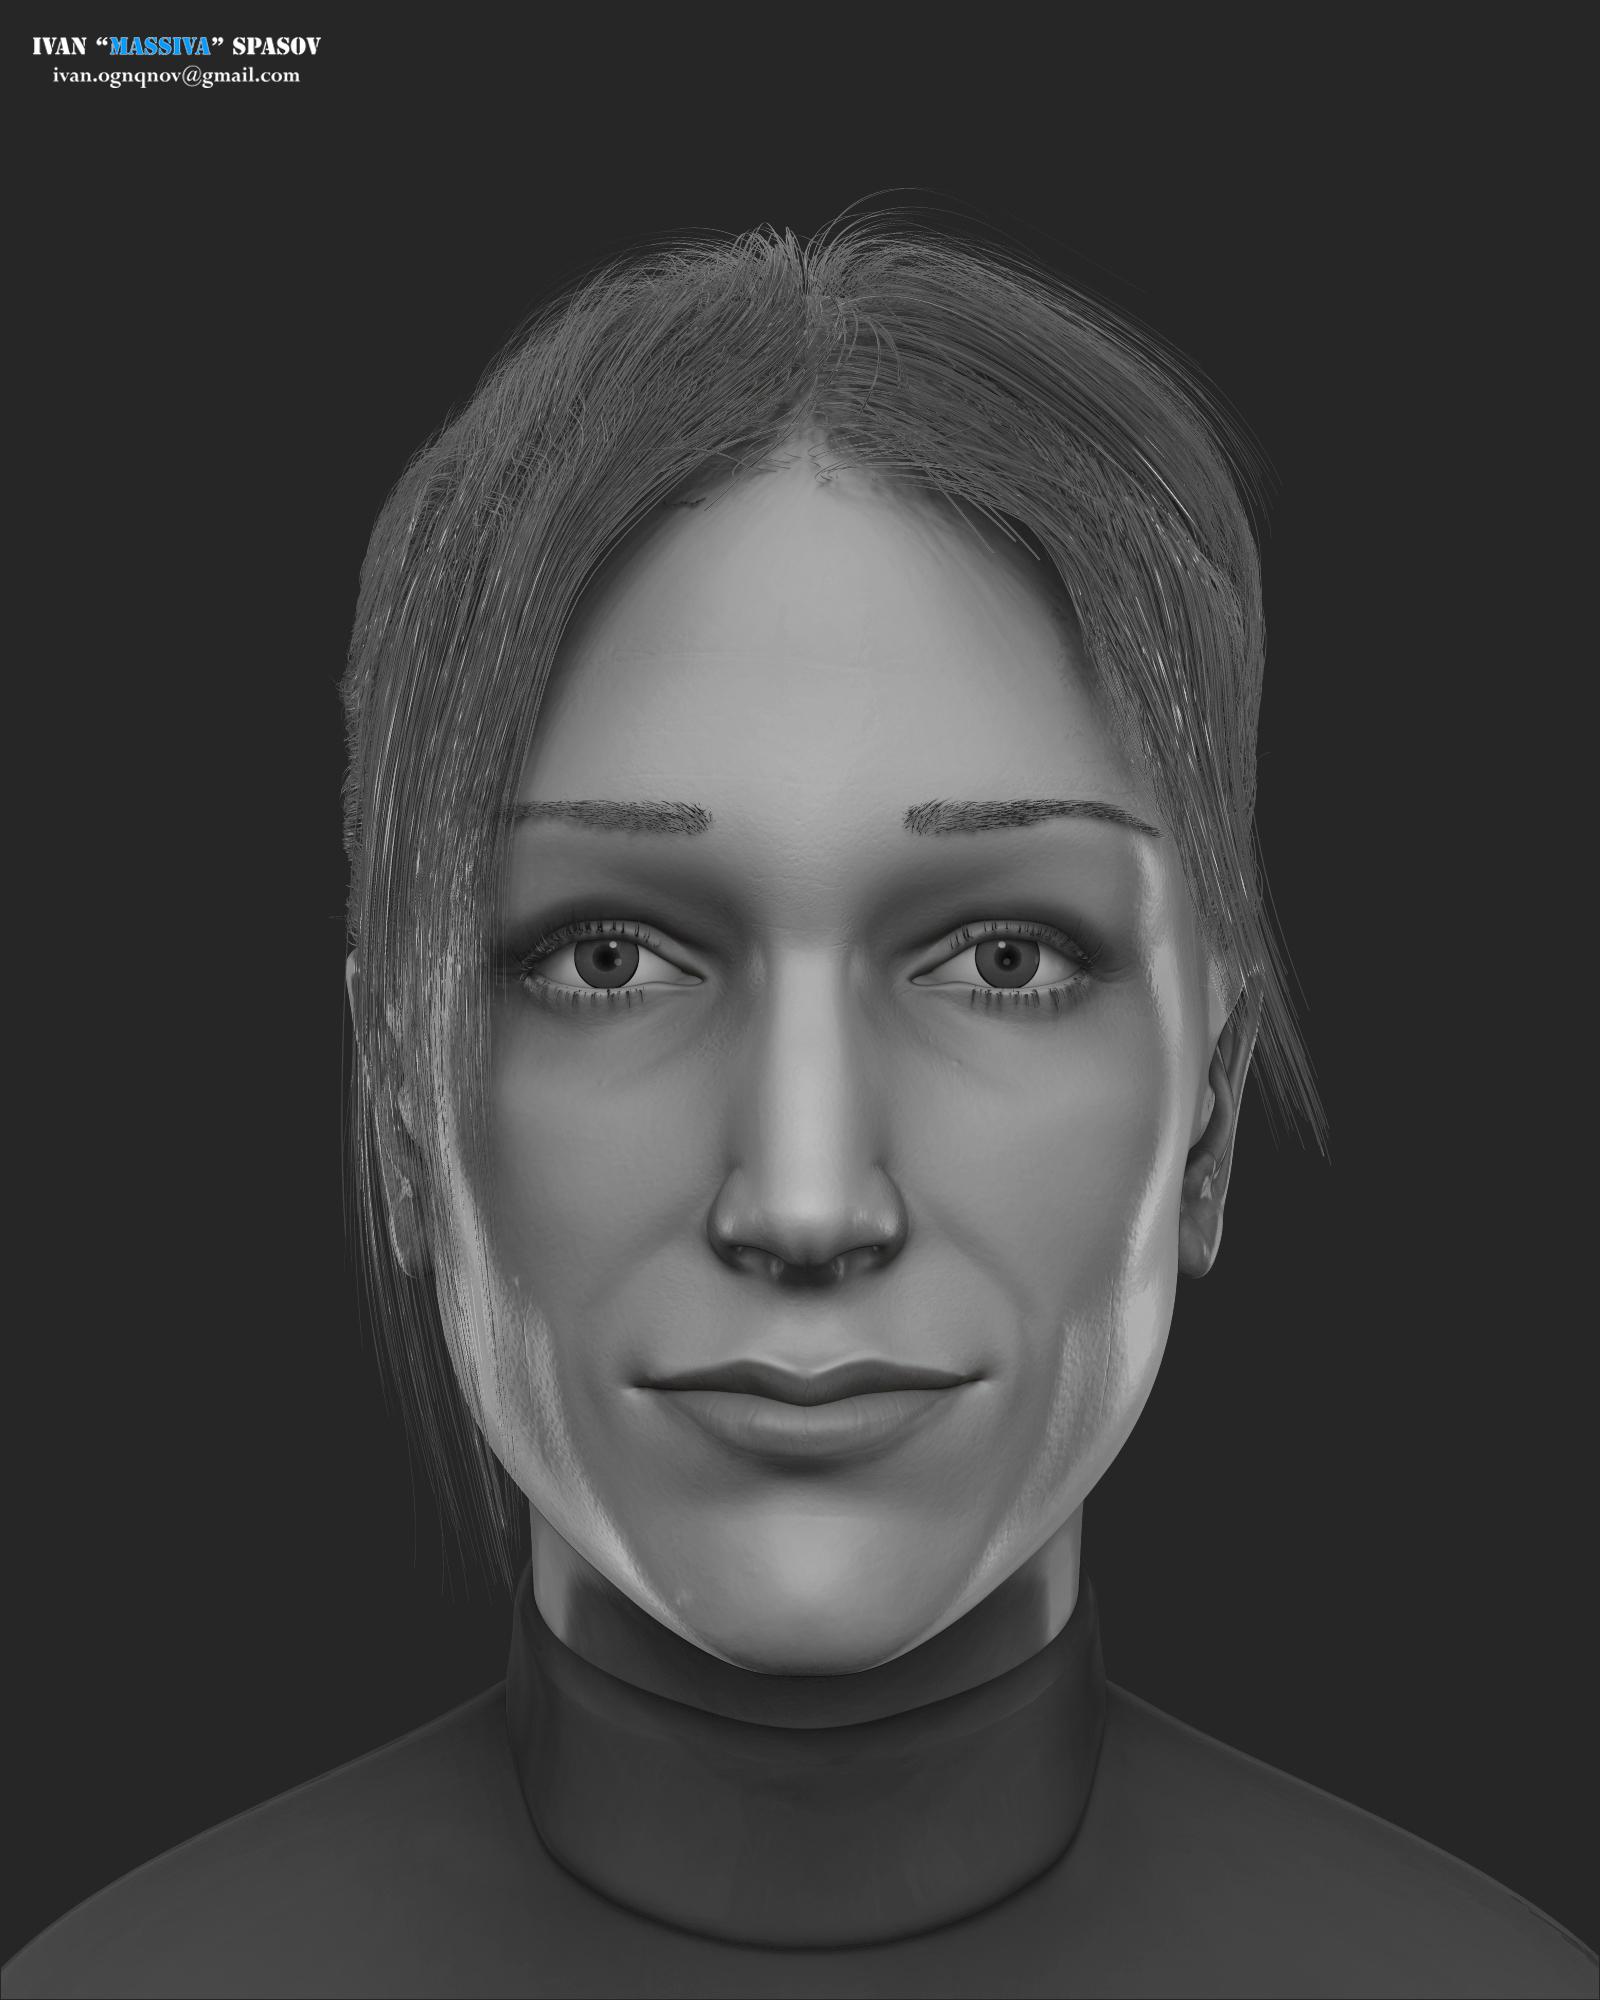 Alex Reid Portrait Study by ivanognqnov on DeviantArt